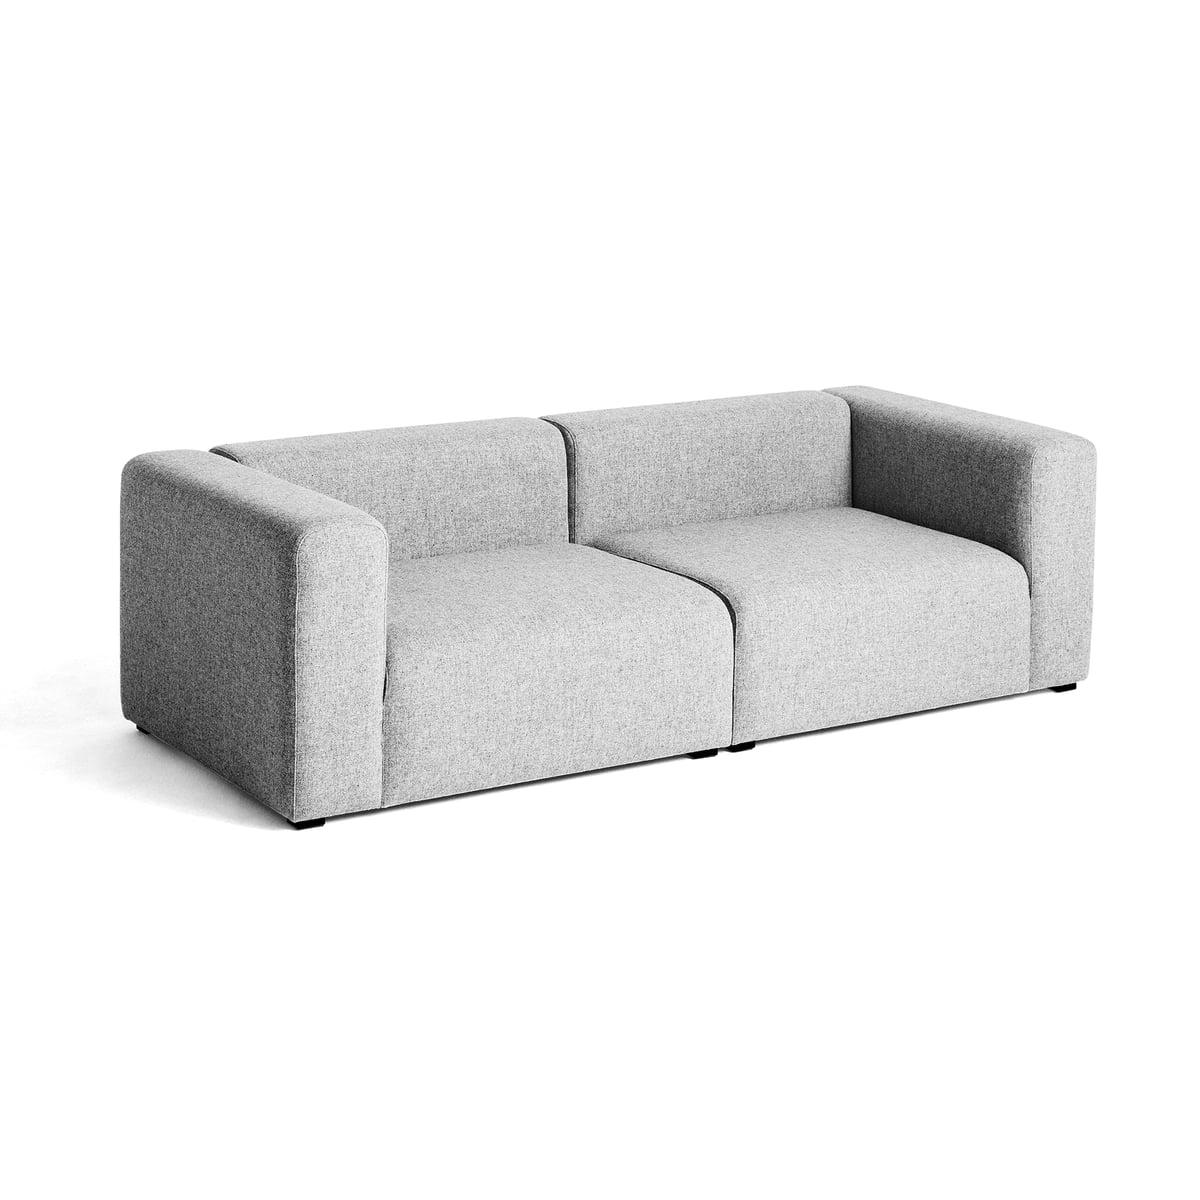 Hay mags sofa 2 5 sitzer kombination 1 hellgrau hallingdal 130